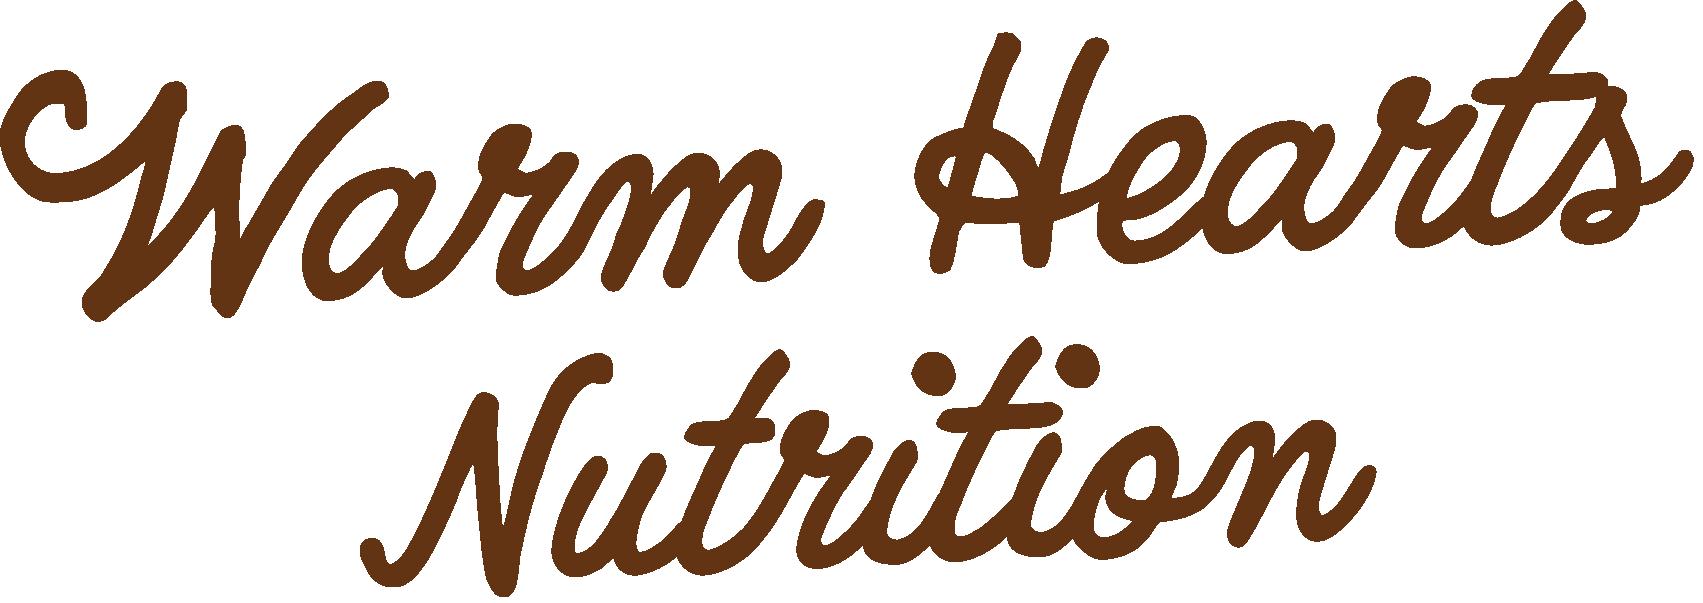 Warm Hearts Nutrition